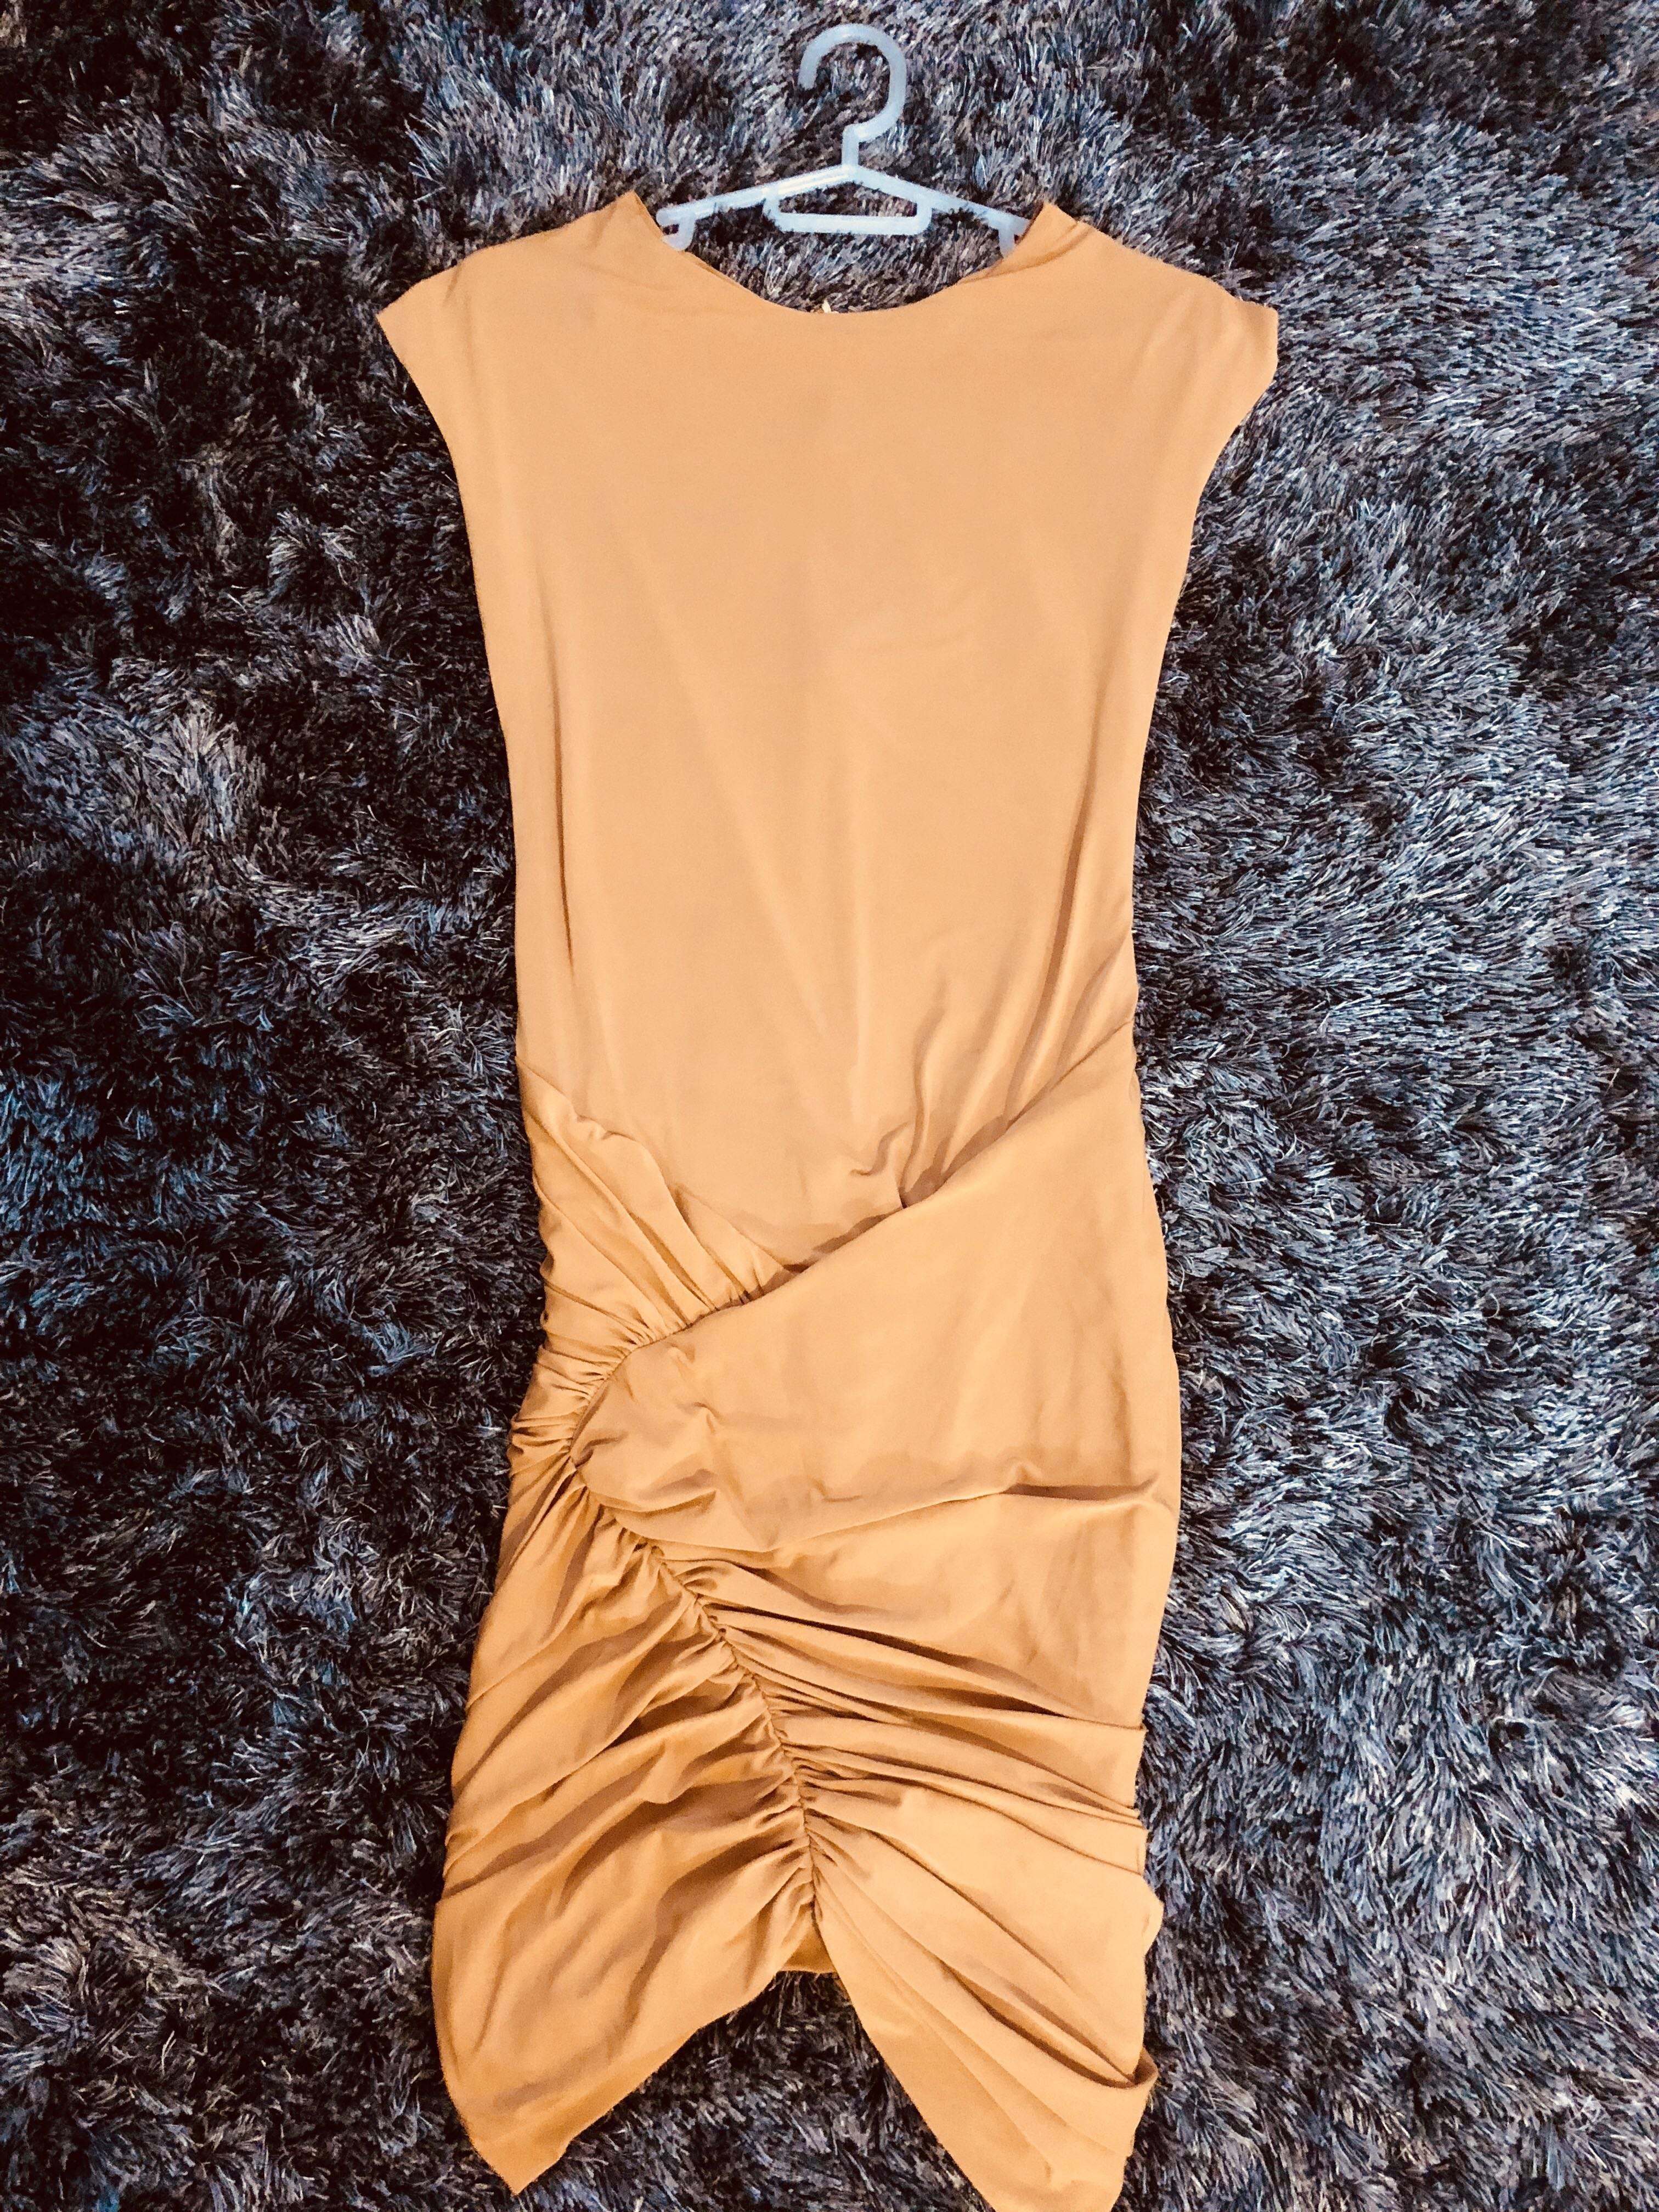 Tyler dress